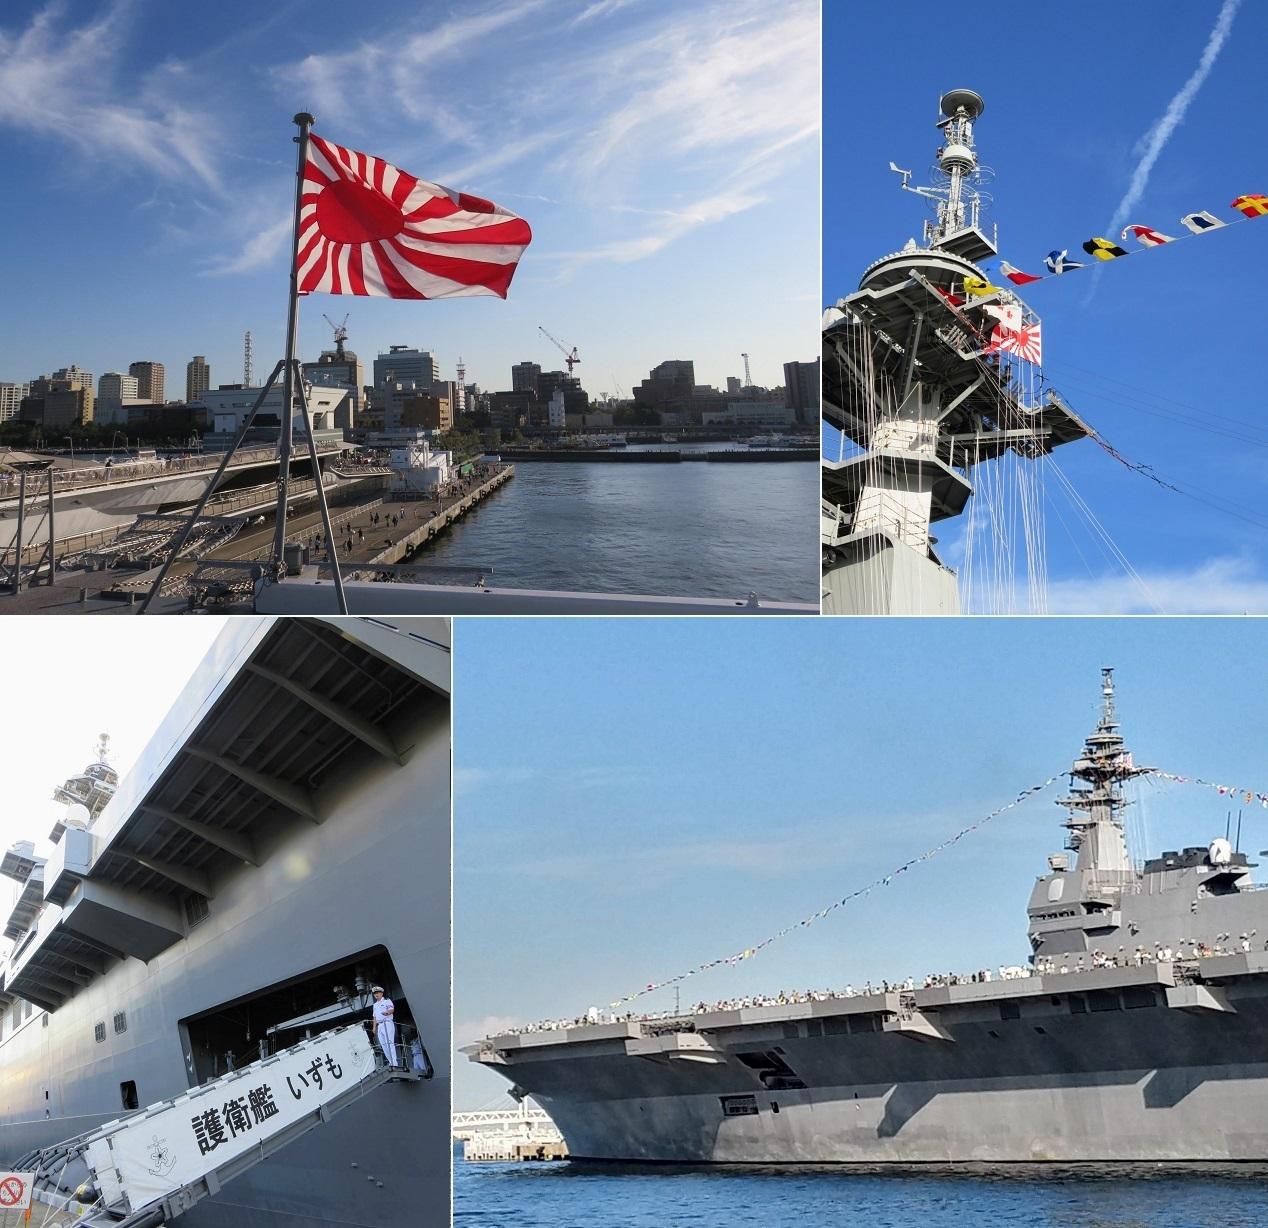 FLEETWEEK2019横浜 - 護衛艦「いずも」一般公開_a0057402_05093949.jpg